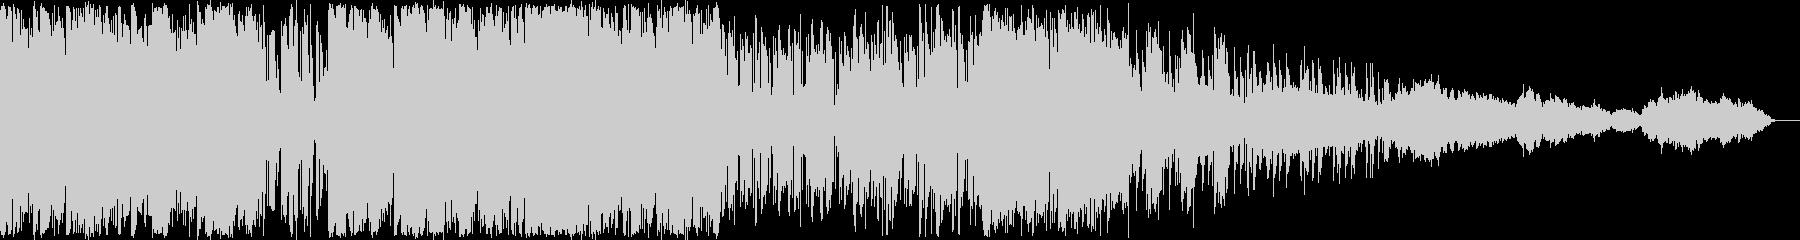 BGM_サイバーバトルの未再生の波形